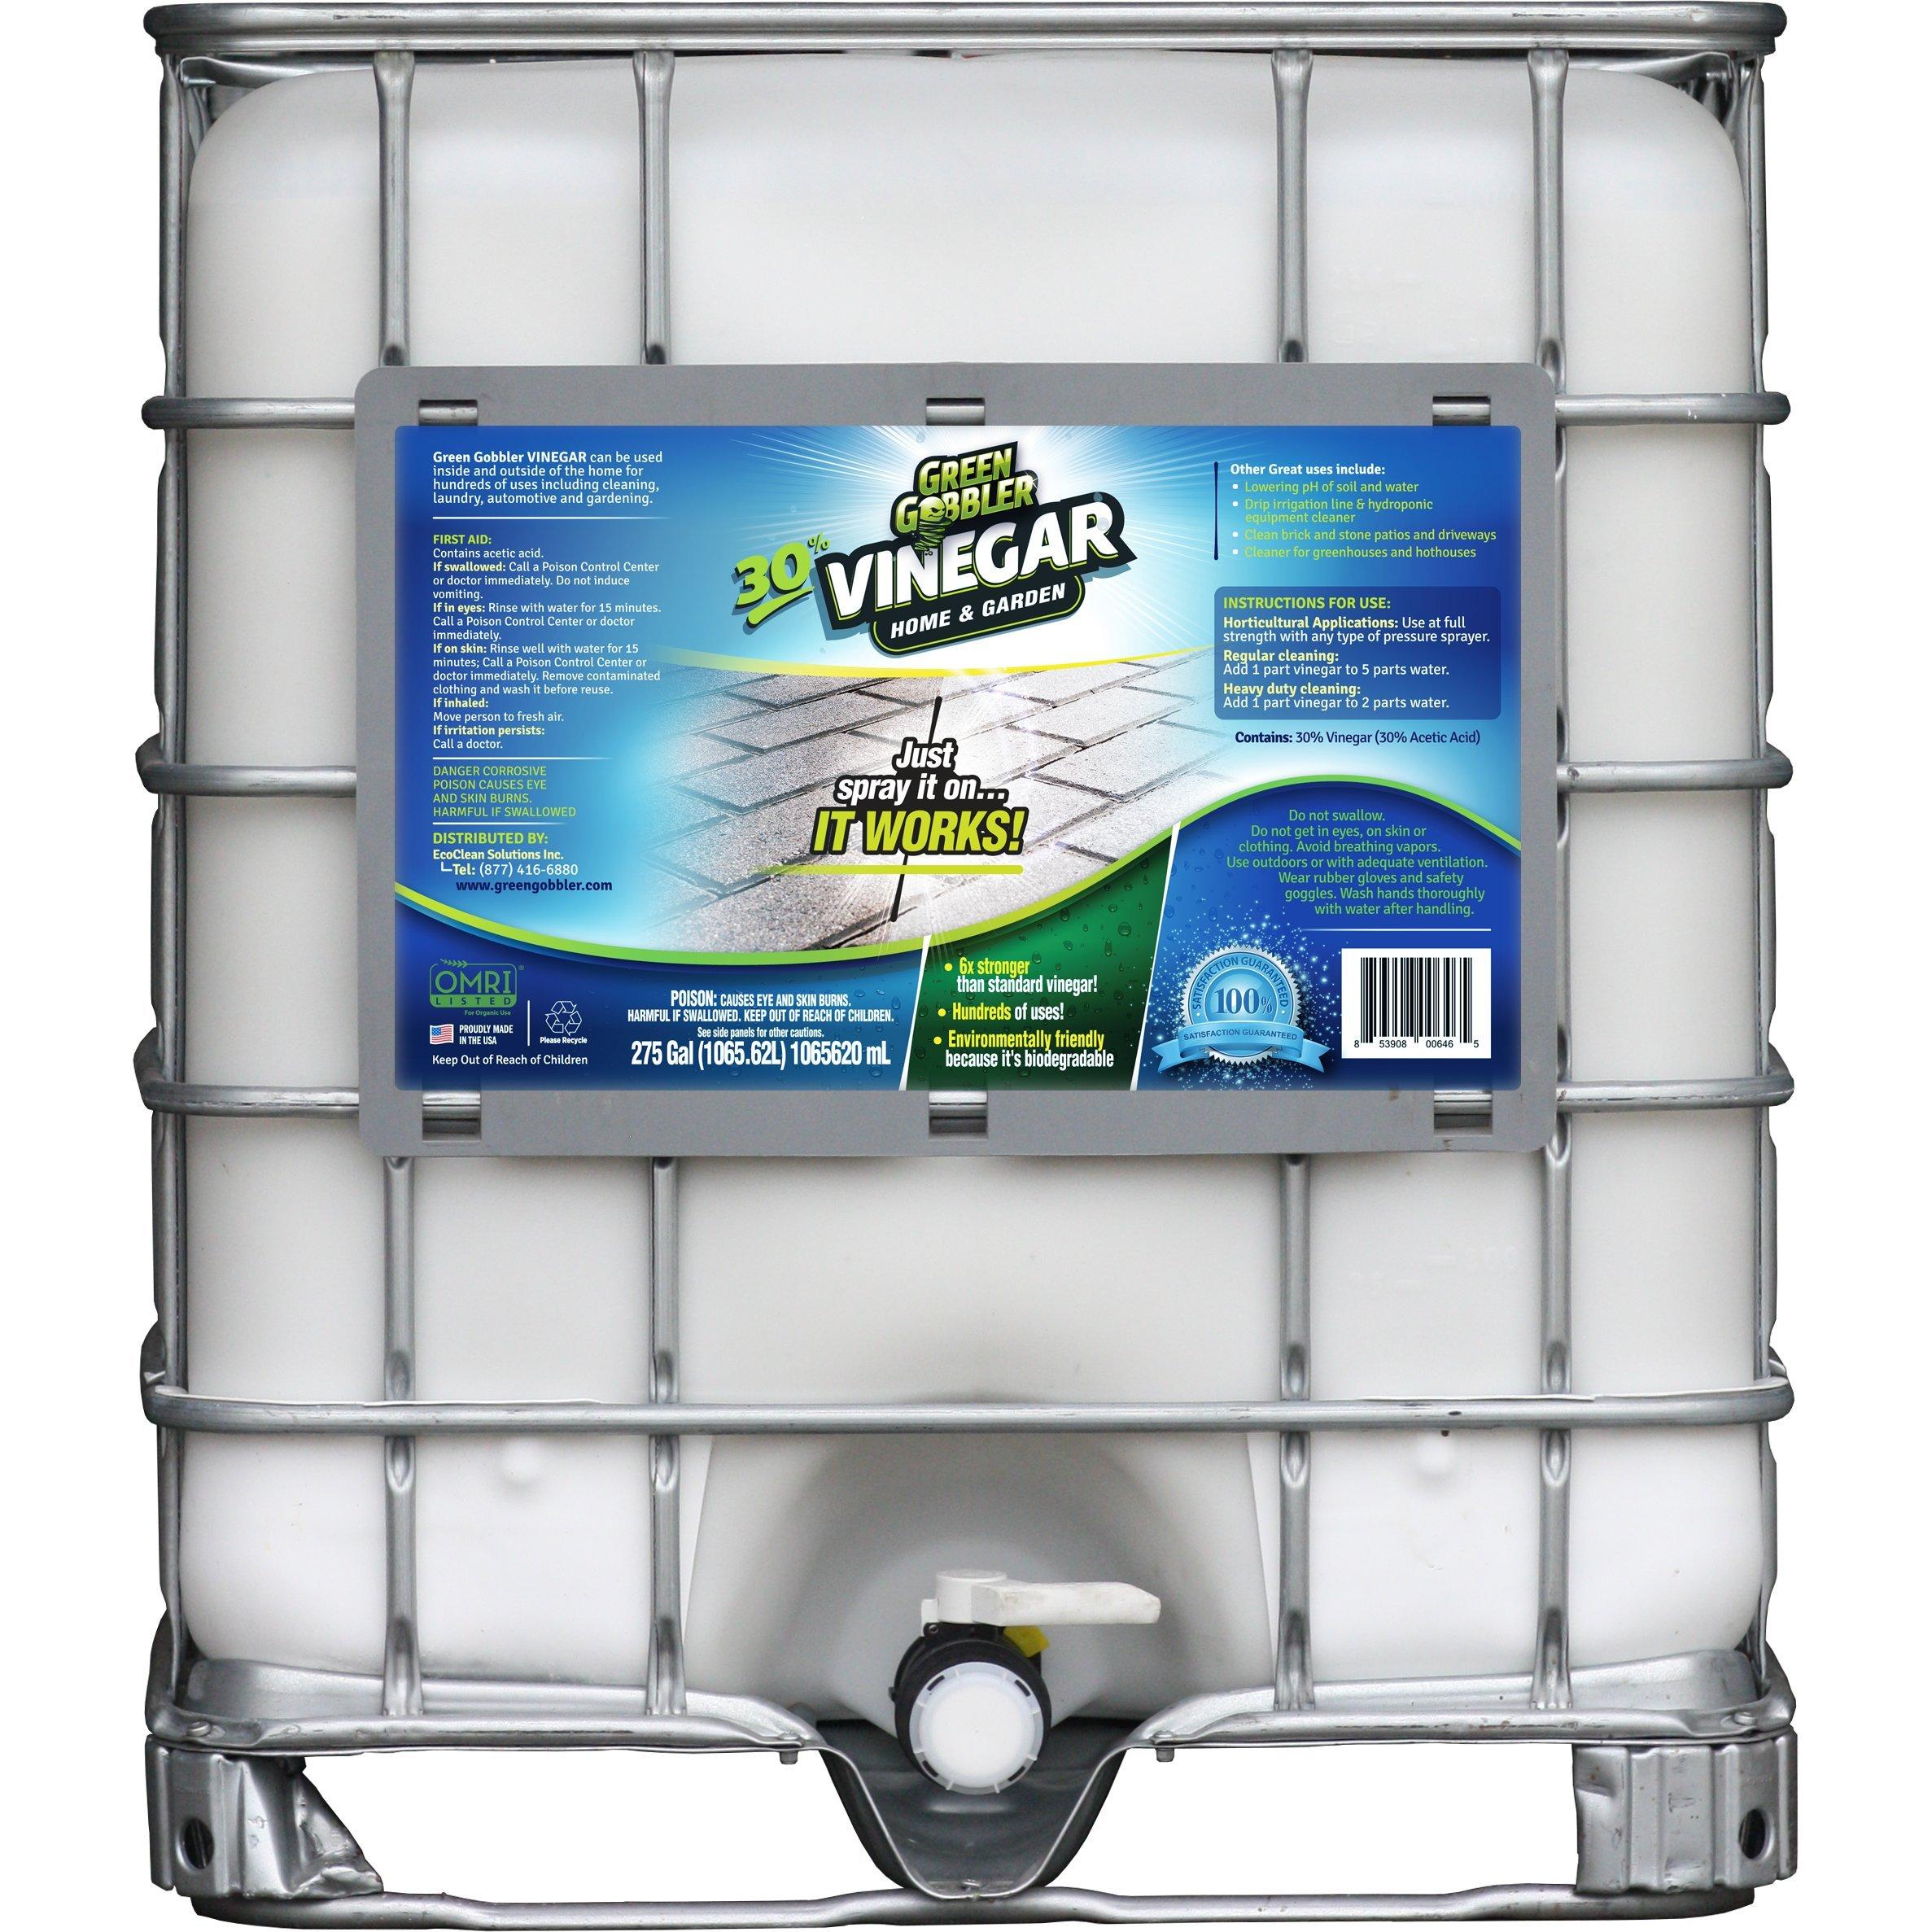 Green Gobbler ULTIMATE VINEGAR Home & Garden - 30% Vinegar Concentrate, Hundreds of Uses! (275 Gallon Tote)